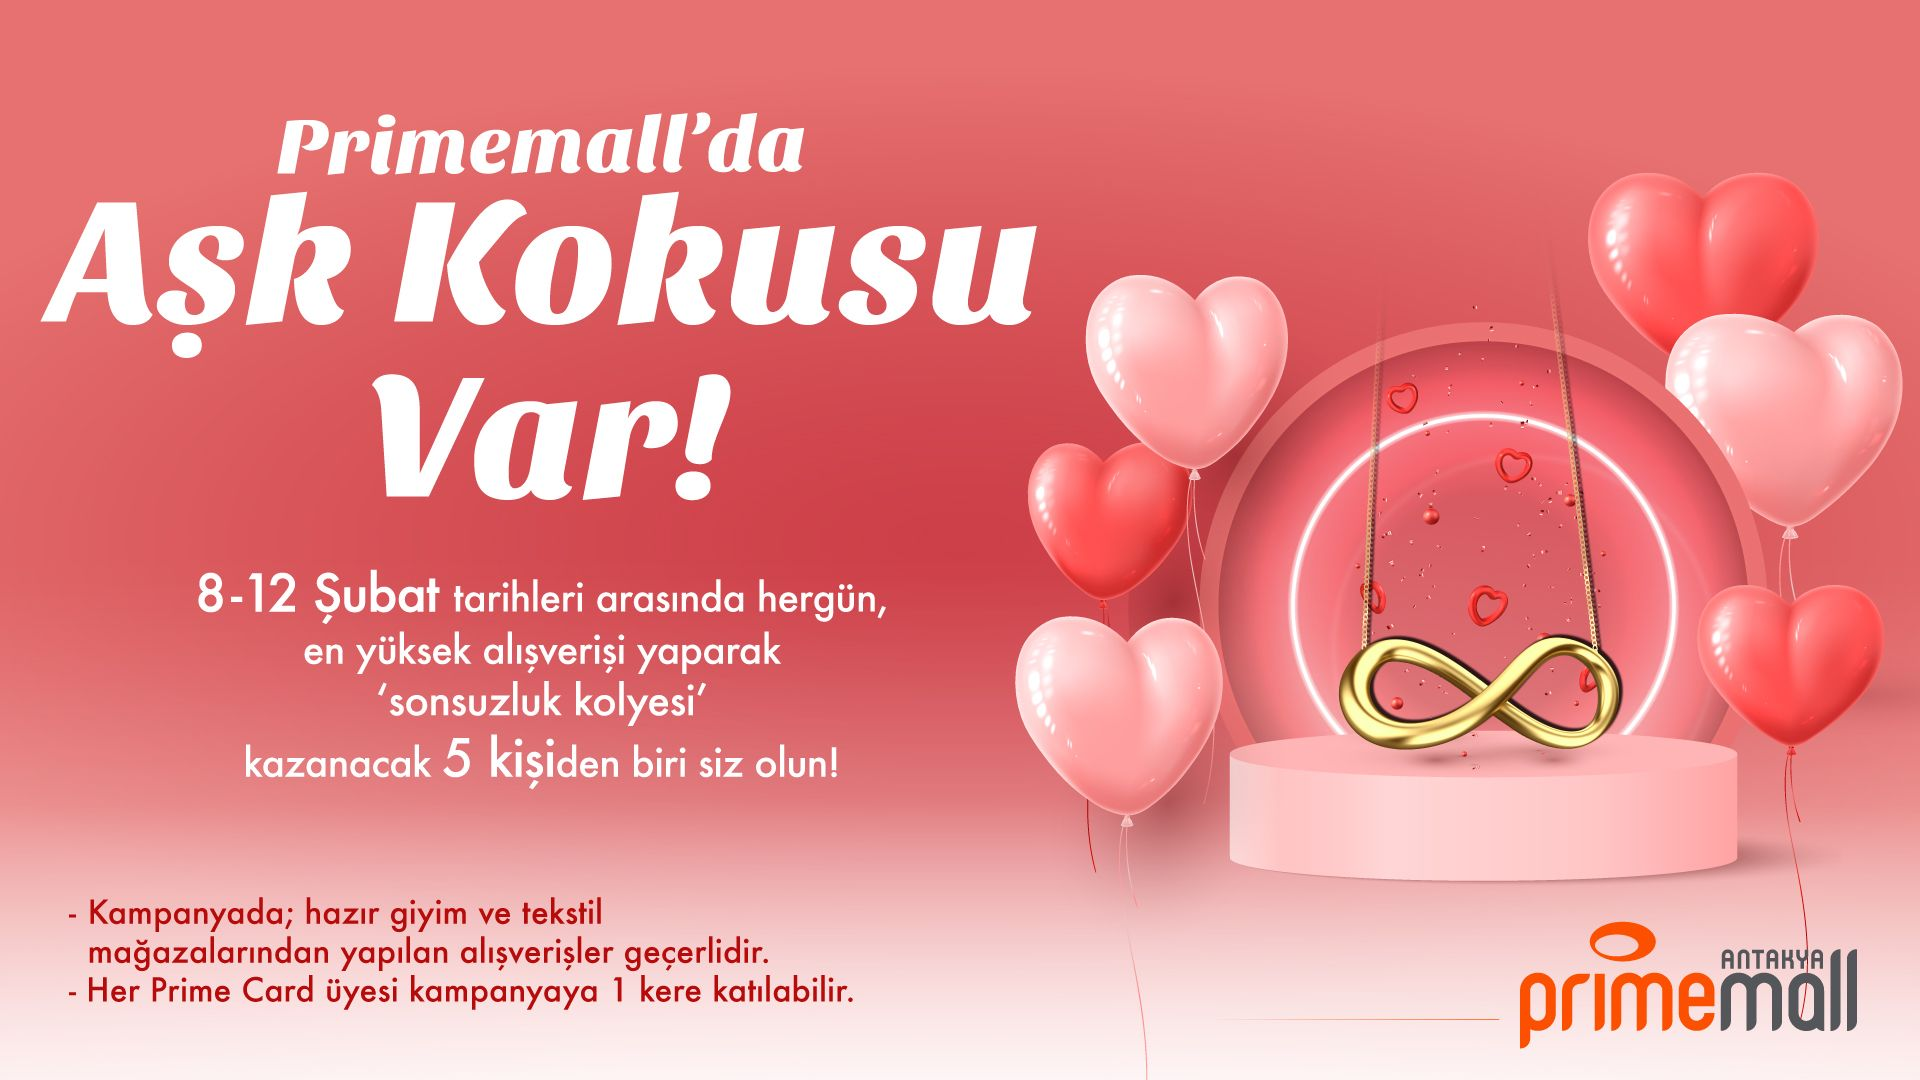 Primemall'da Aşk Kokusu Var